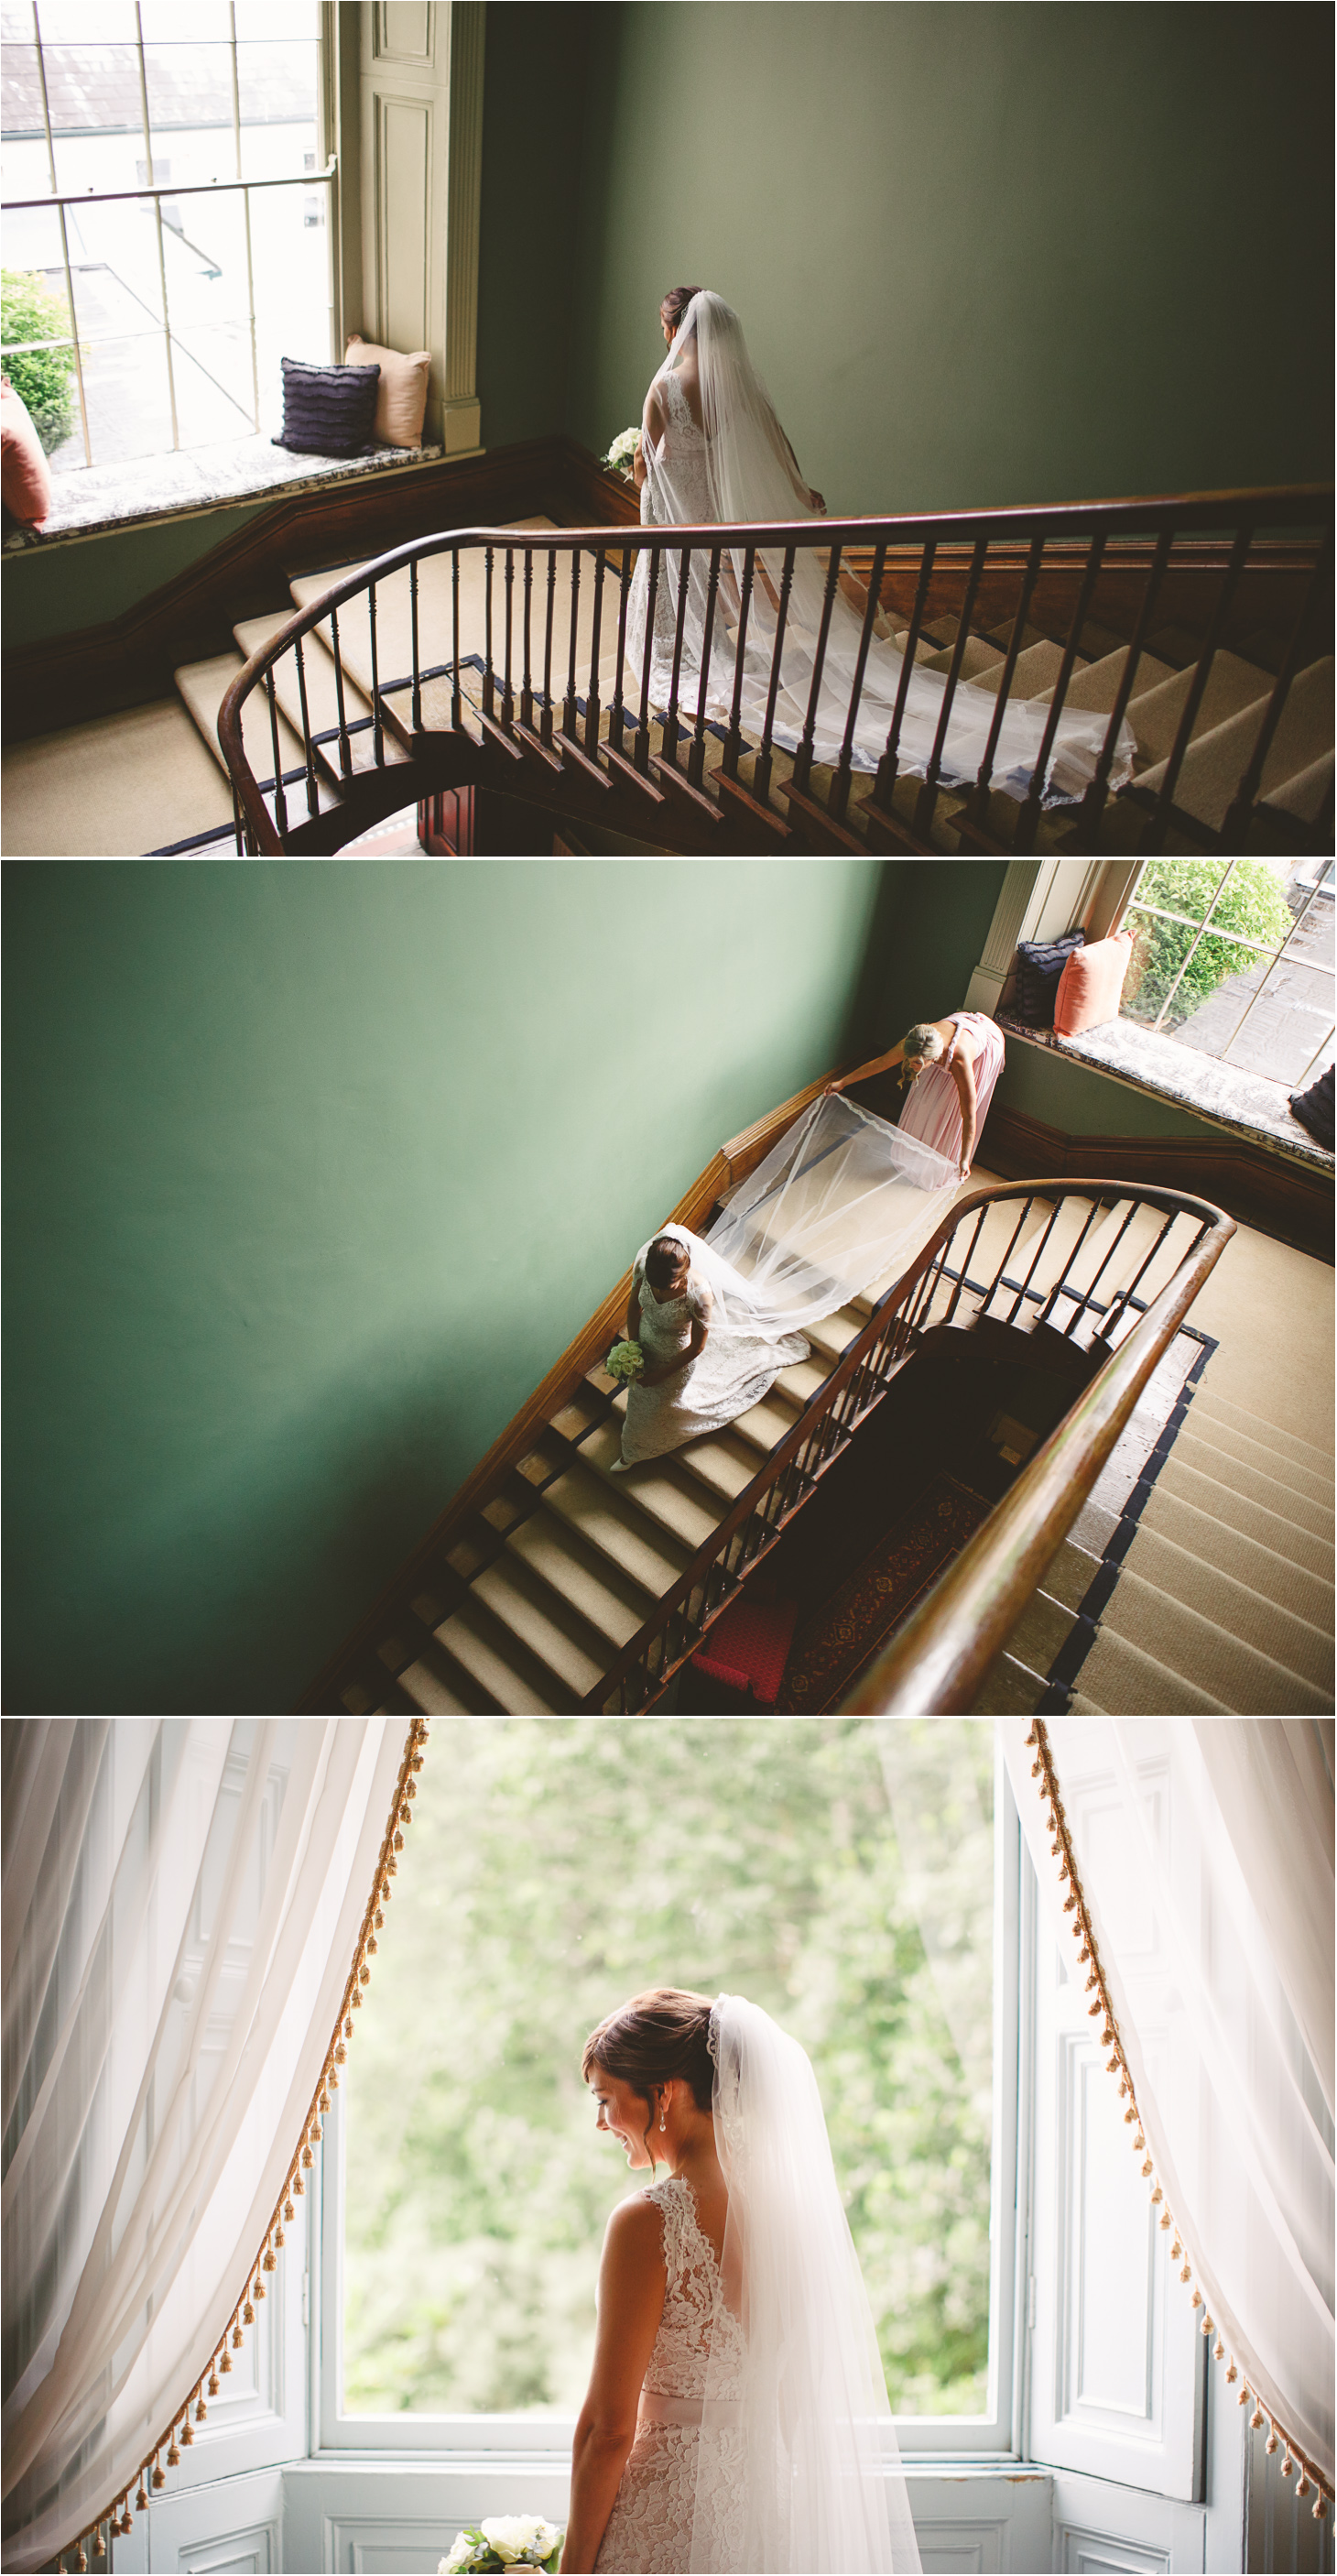 kilshane house. darren fitzpatrick photography 9